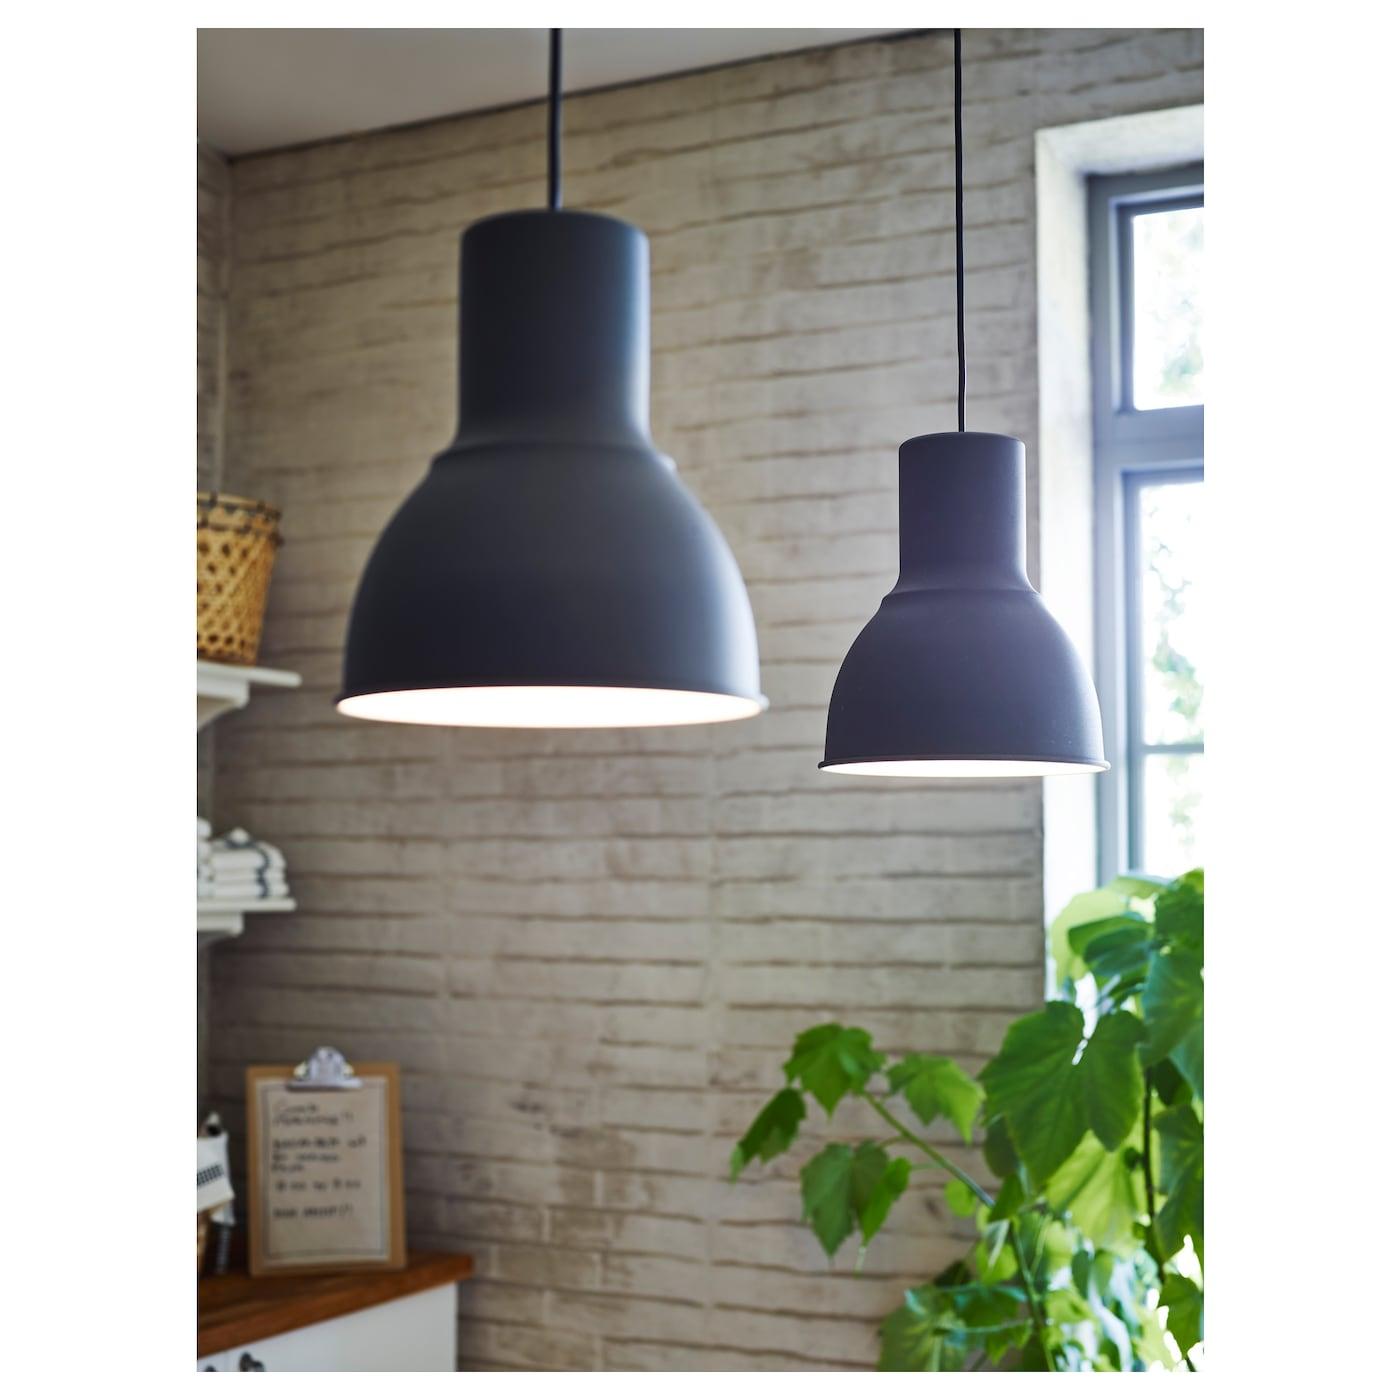 Hektar lampe | FINN.no